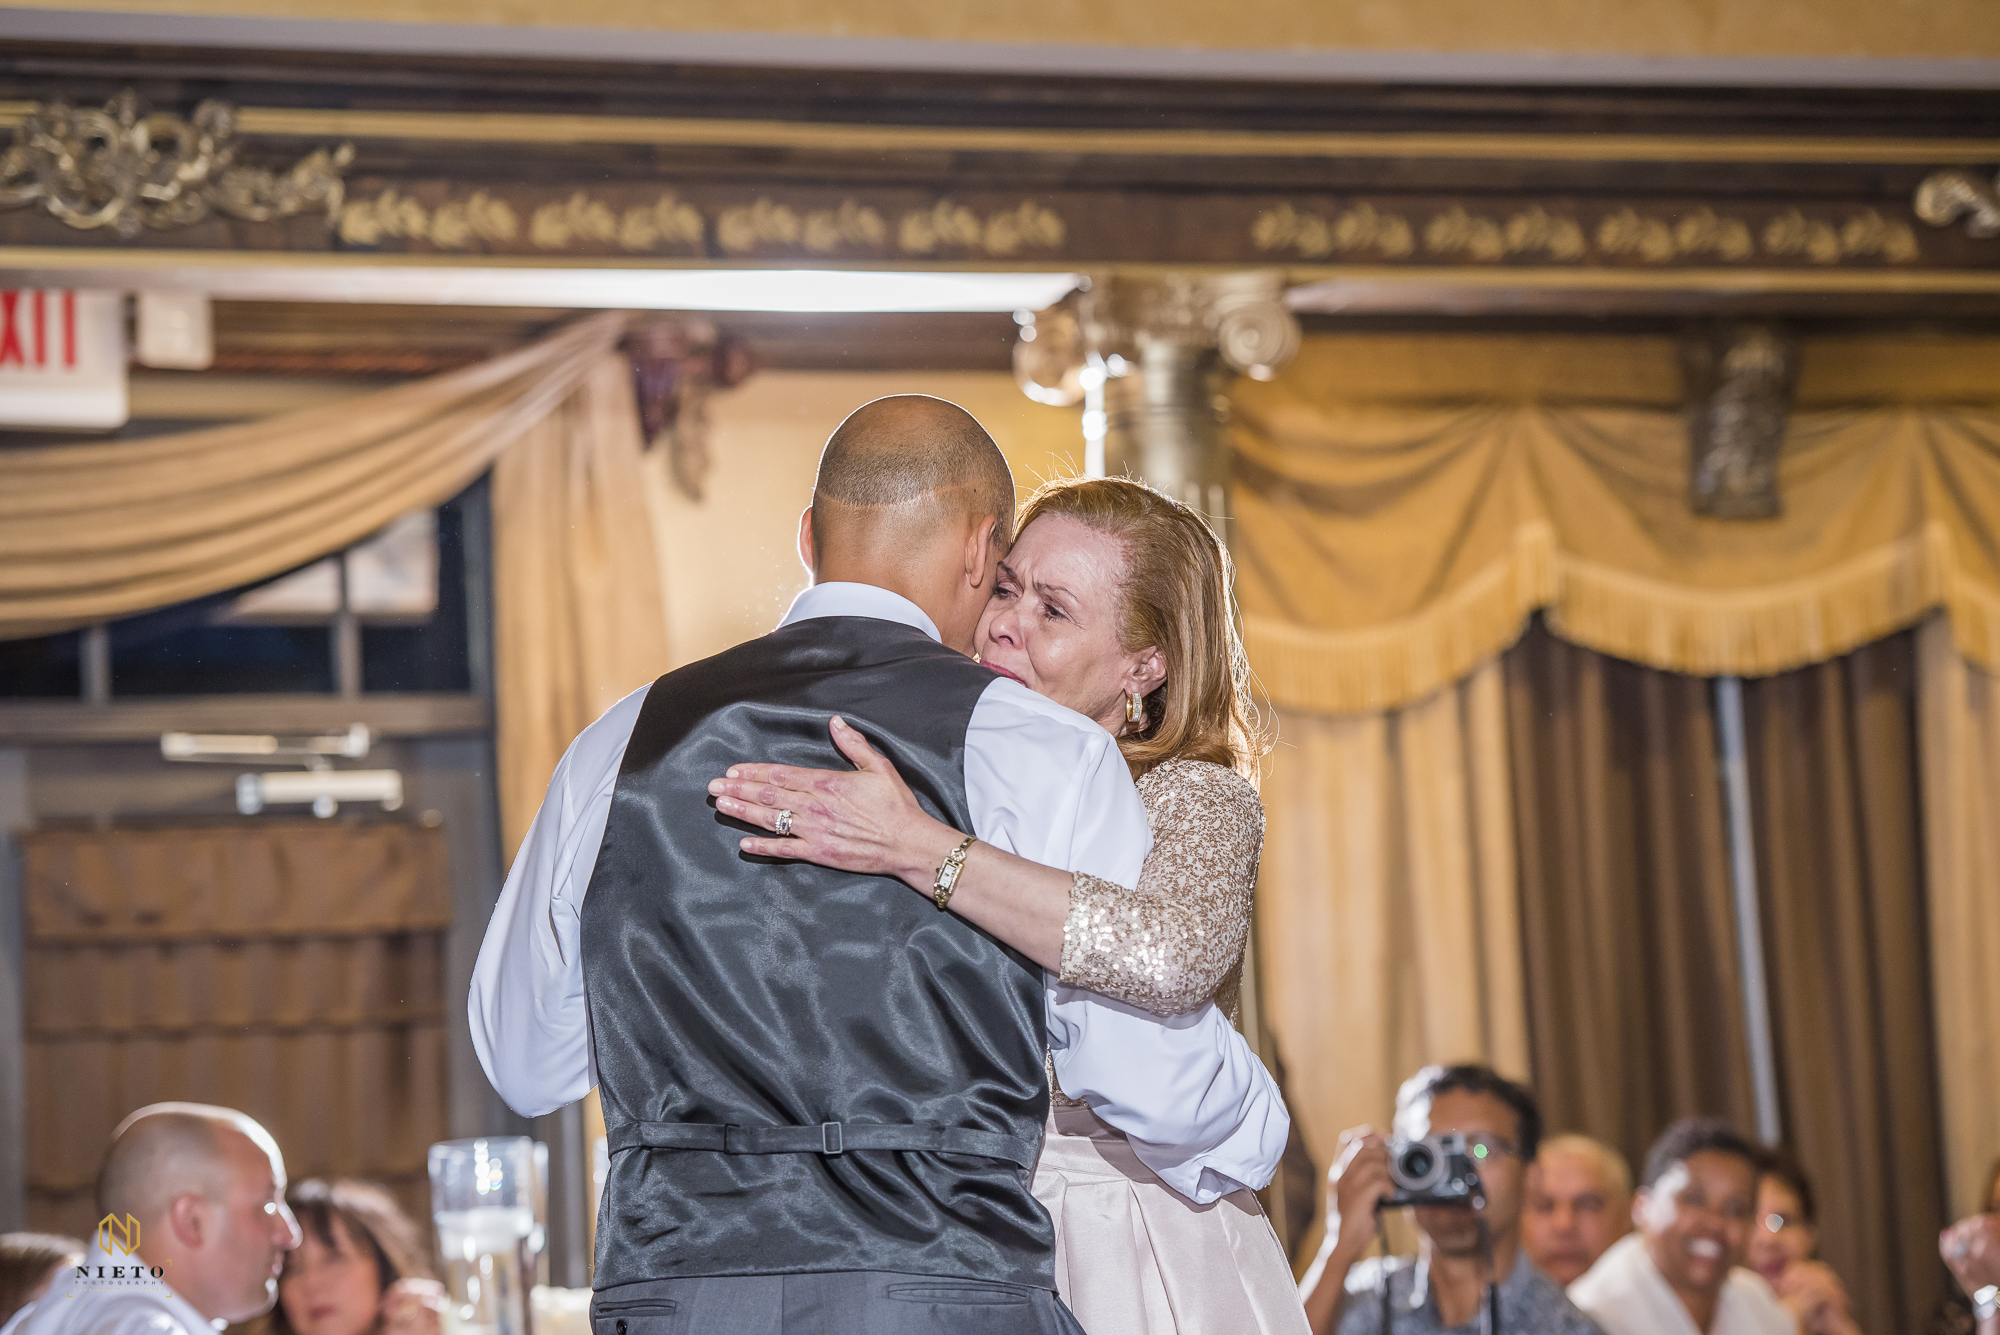 Barclay Villa Wedding - Tegran & Suzanne - 00587 Higgs - Fraites Nieto Photography.jpg